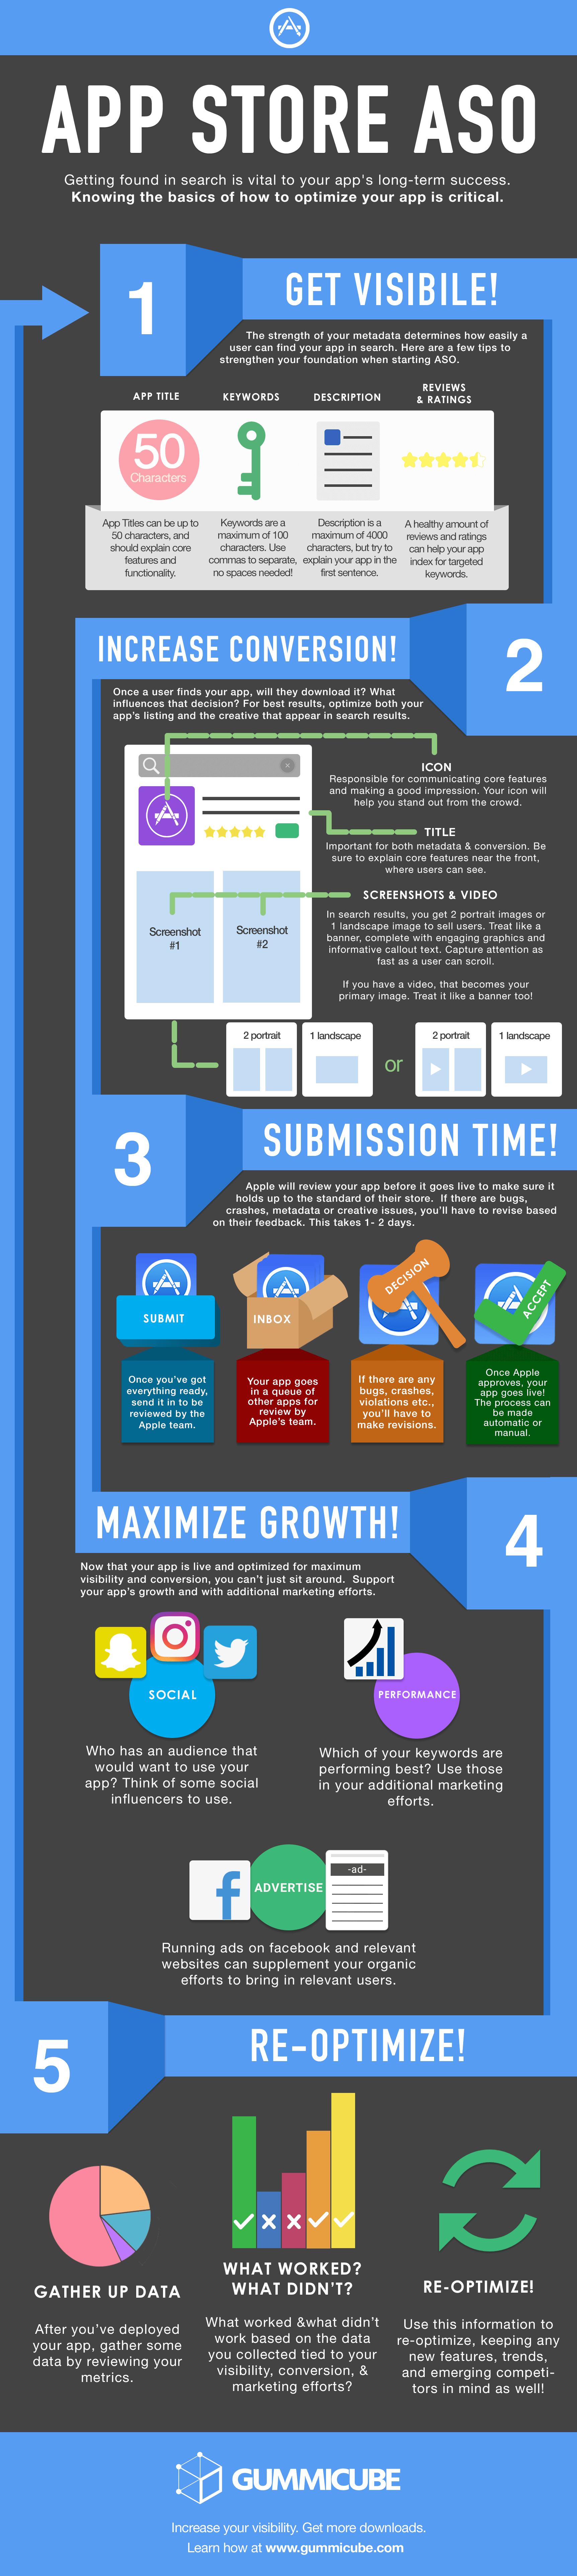 Gummicube_ASO_Infographic